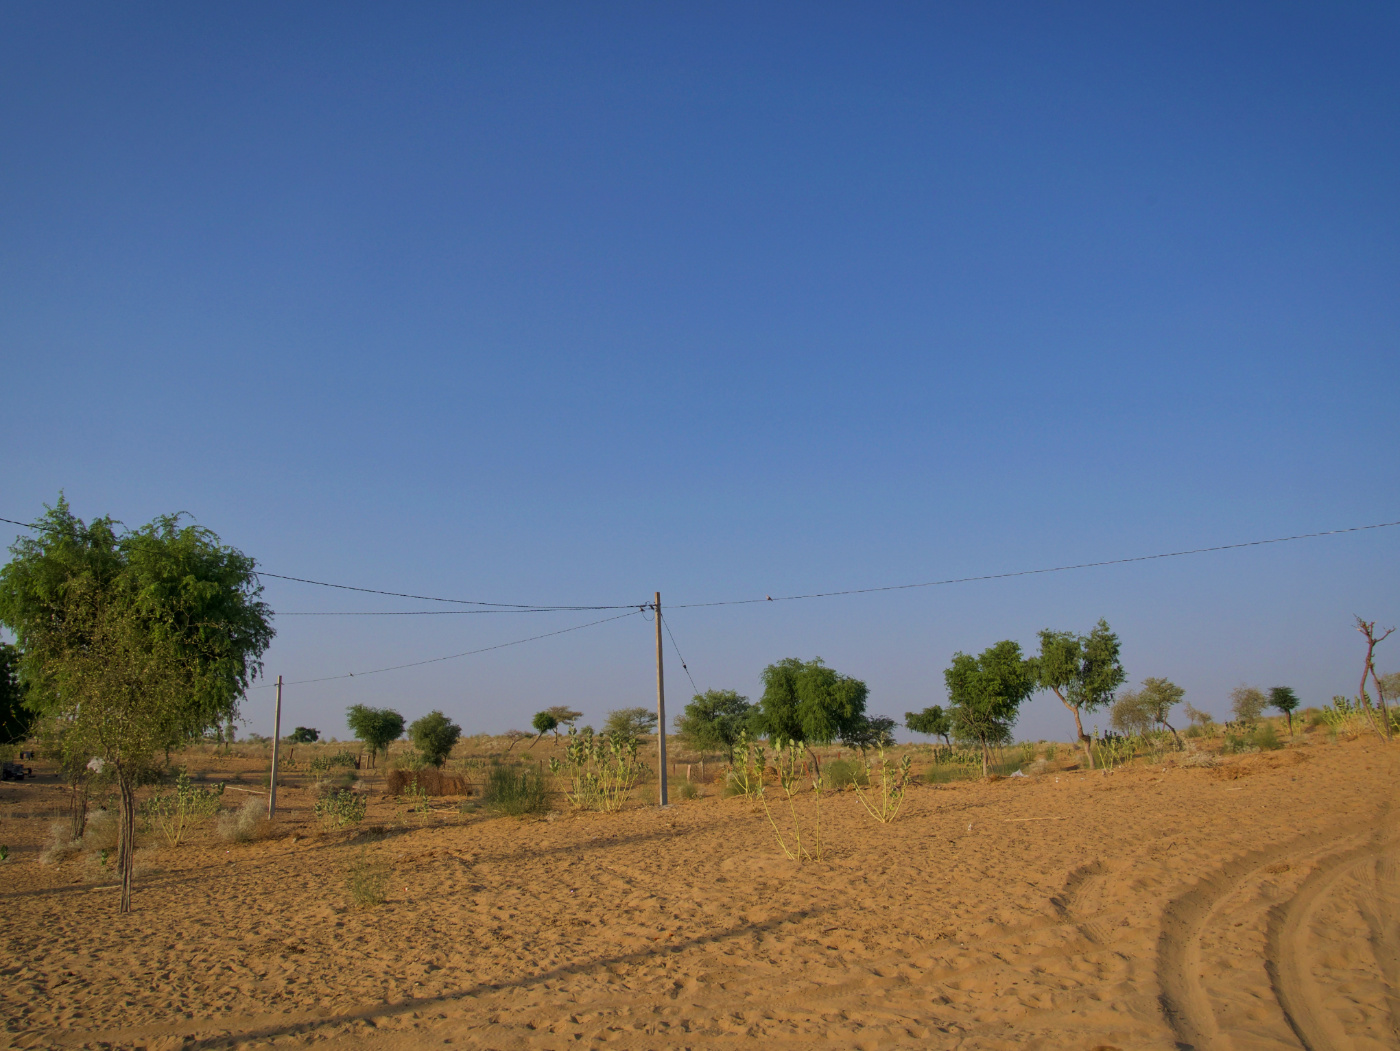 483-India-TharDesert